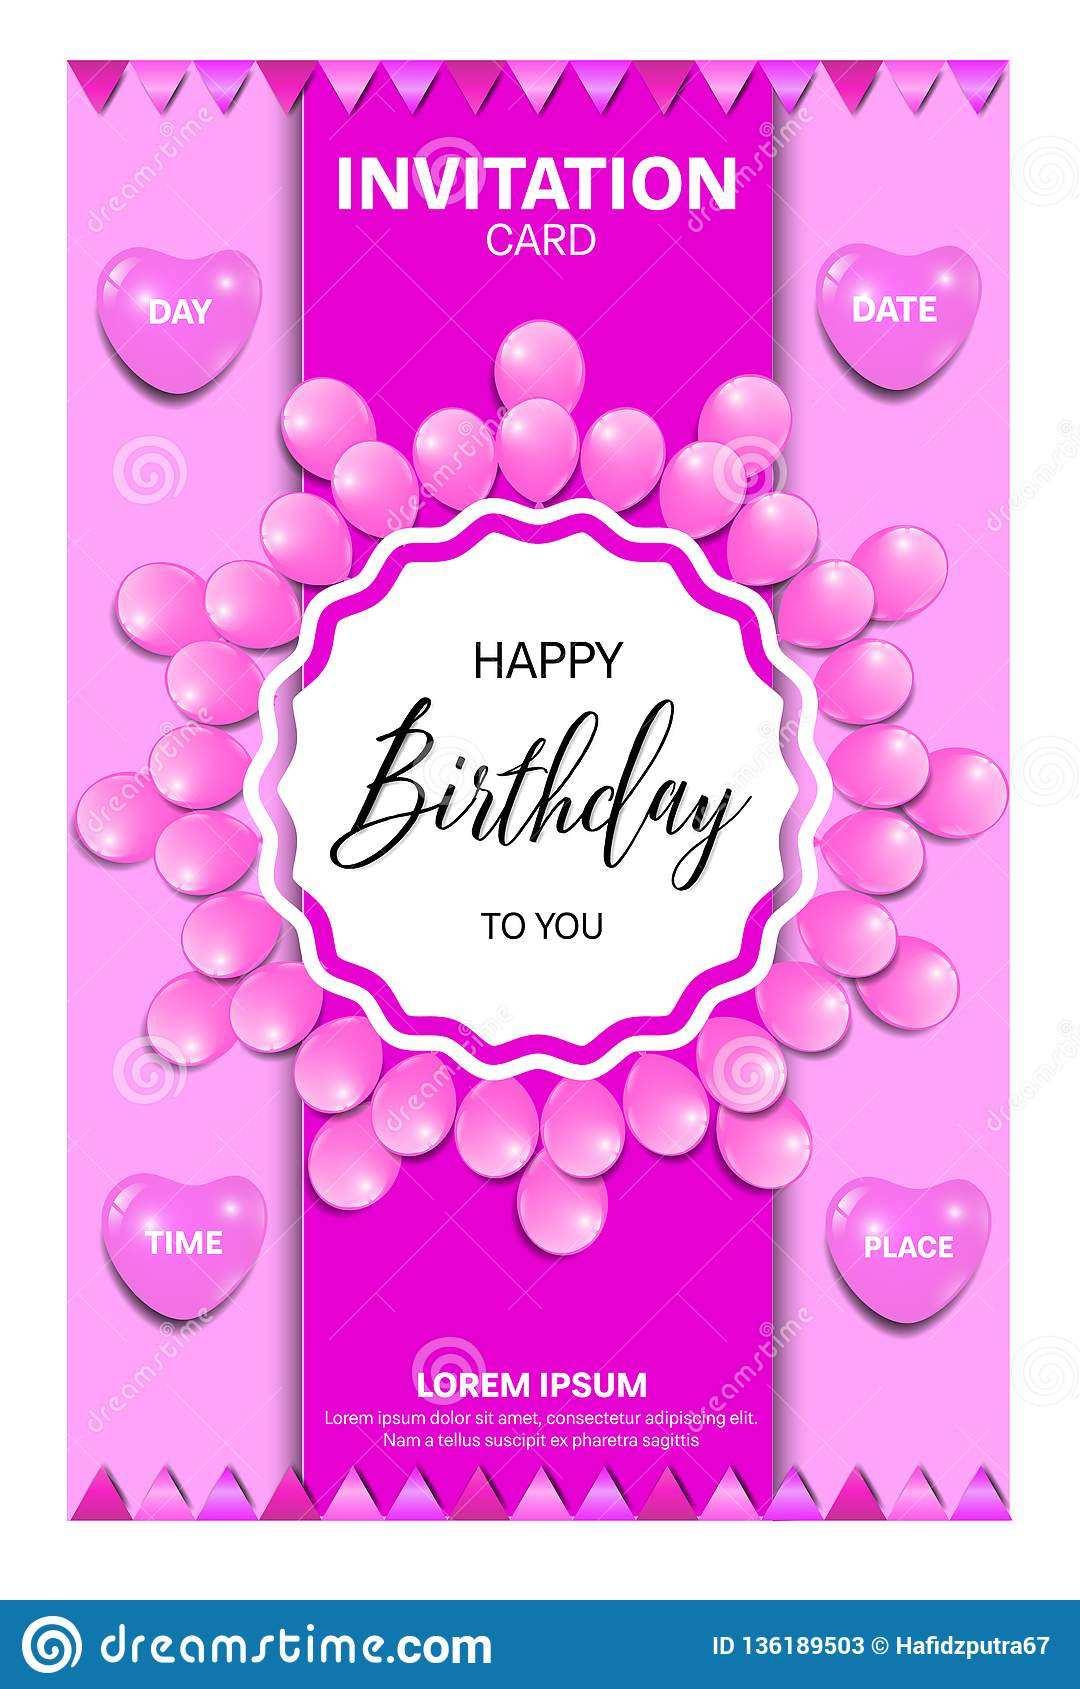 11 how to create birthday invitation